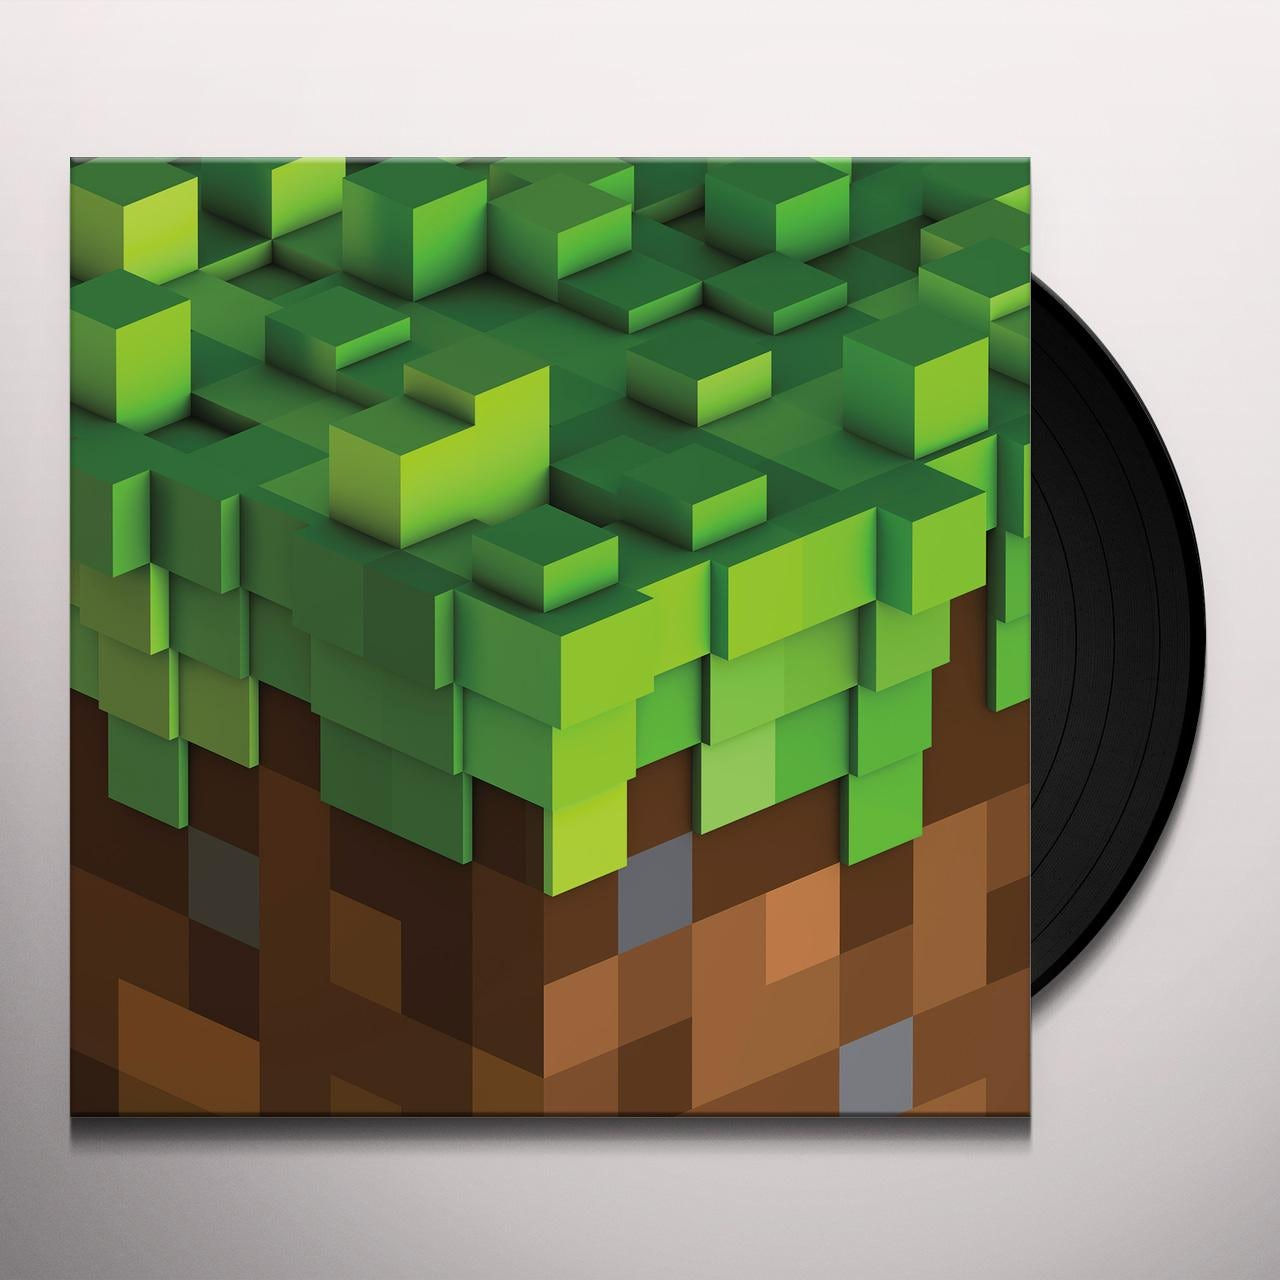 C418 Minecraft Volume Alpha Vinyl Record